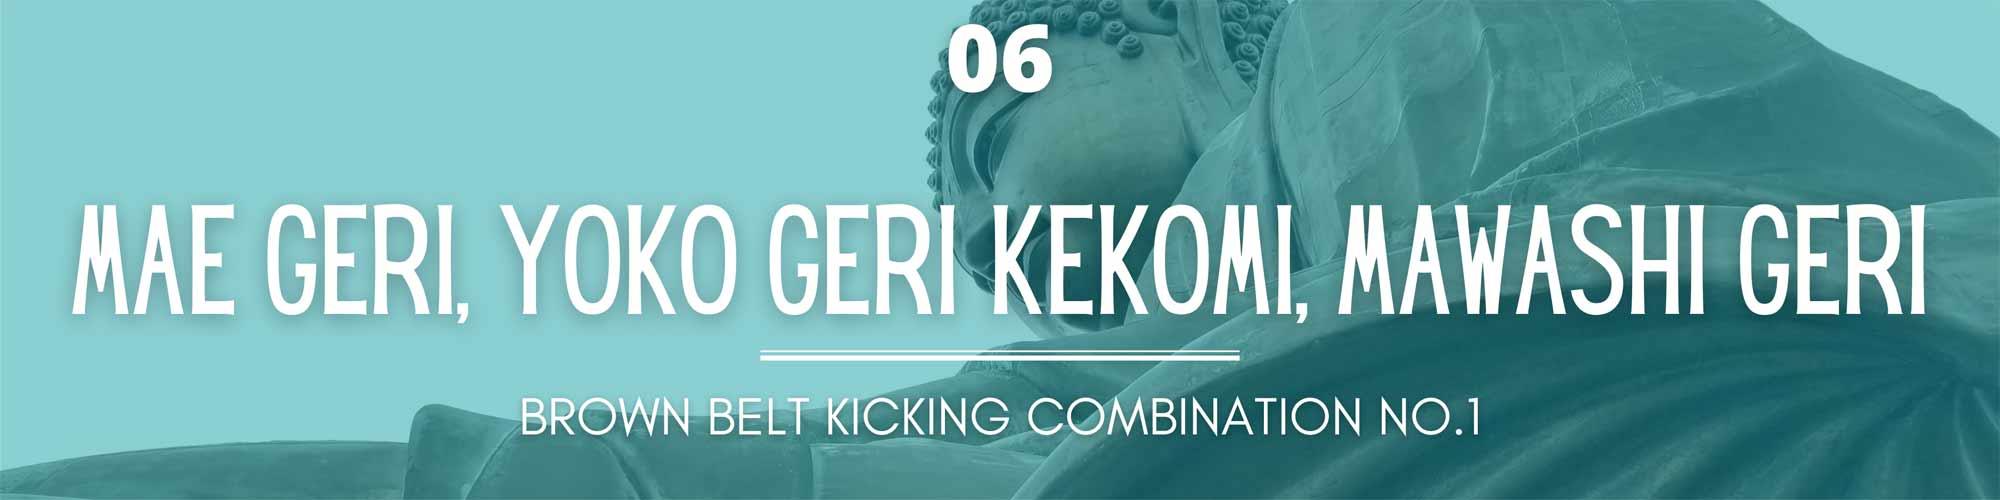 brown belt kicking combination 1